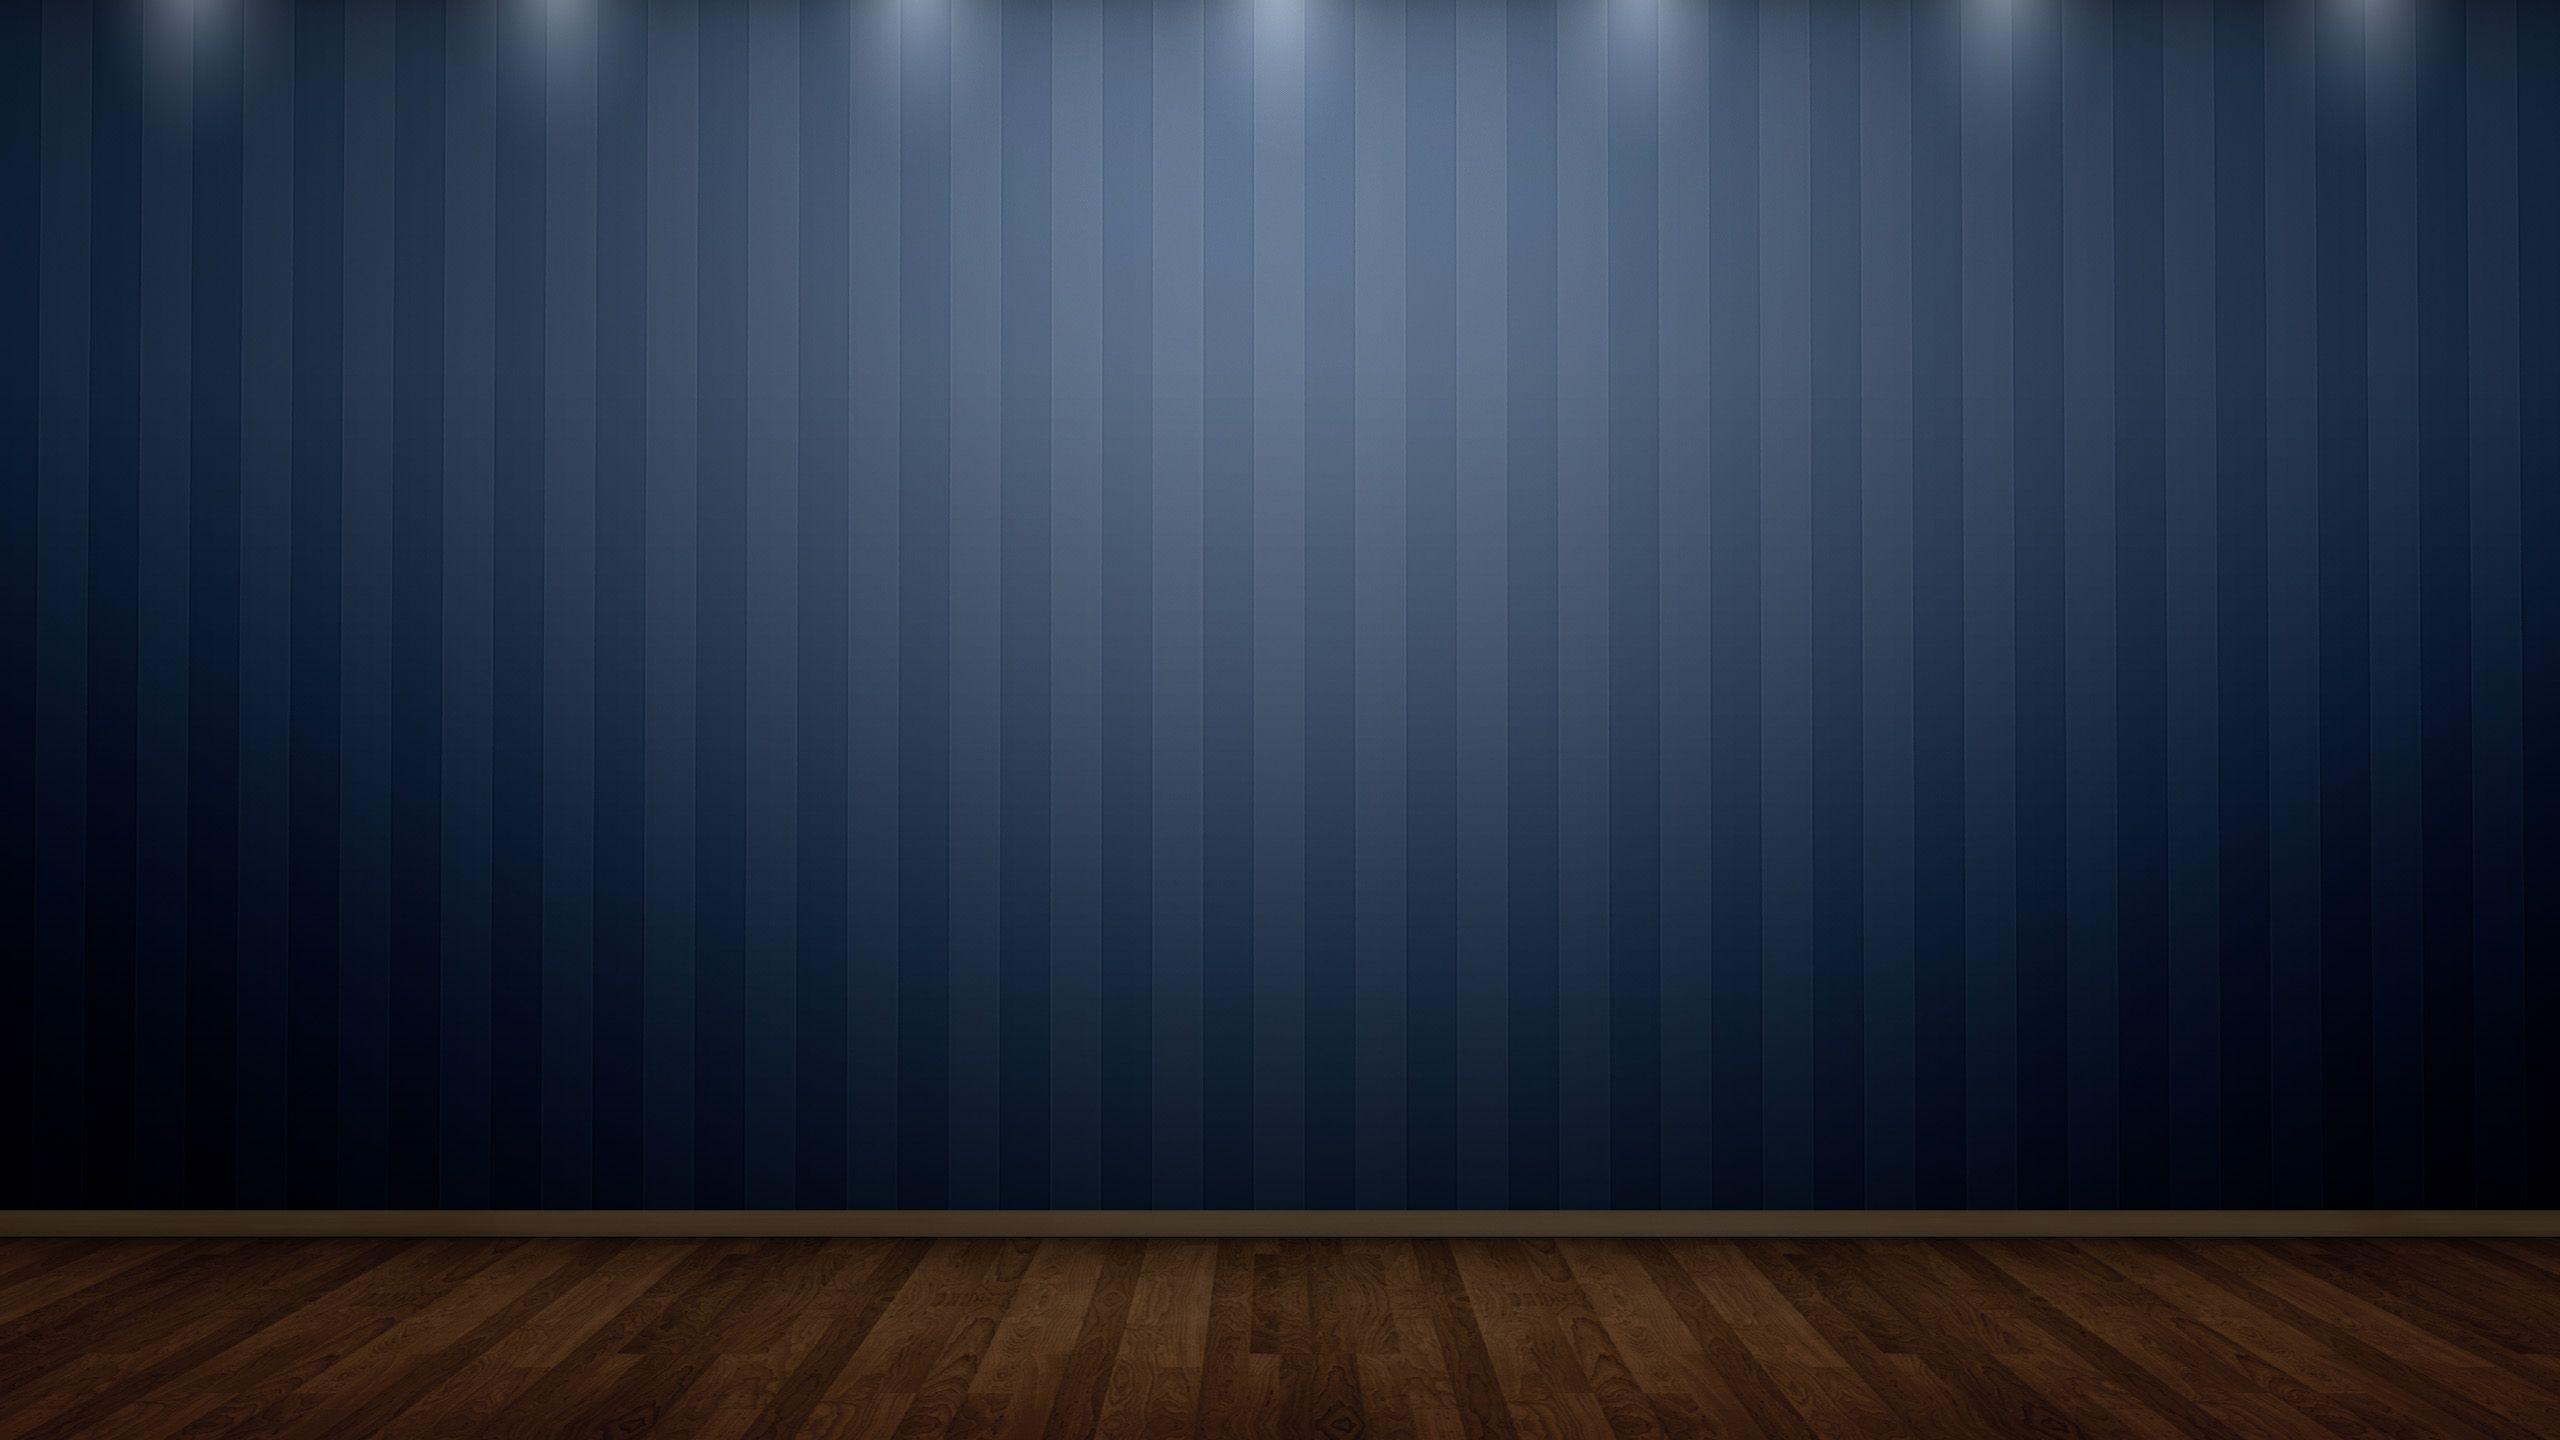 Blue Striped Wallpaper: Blue Wood Wallpaper